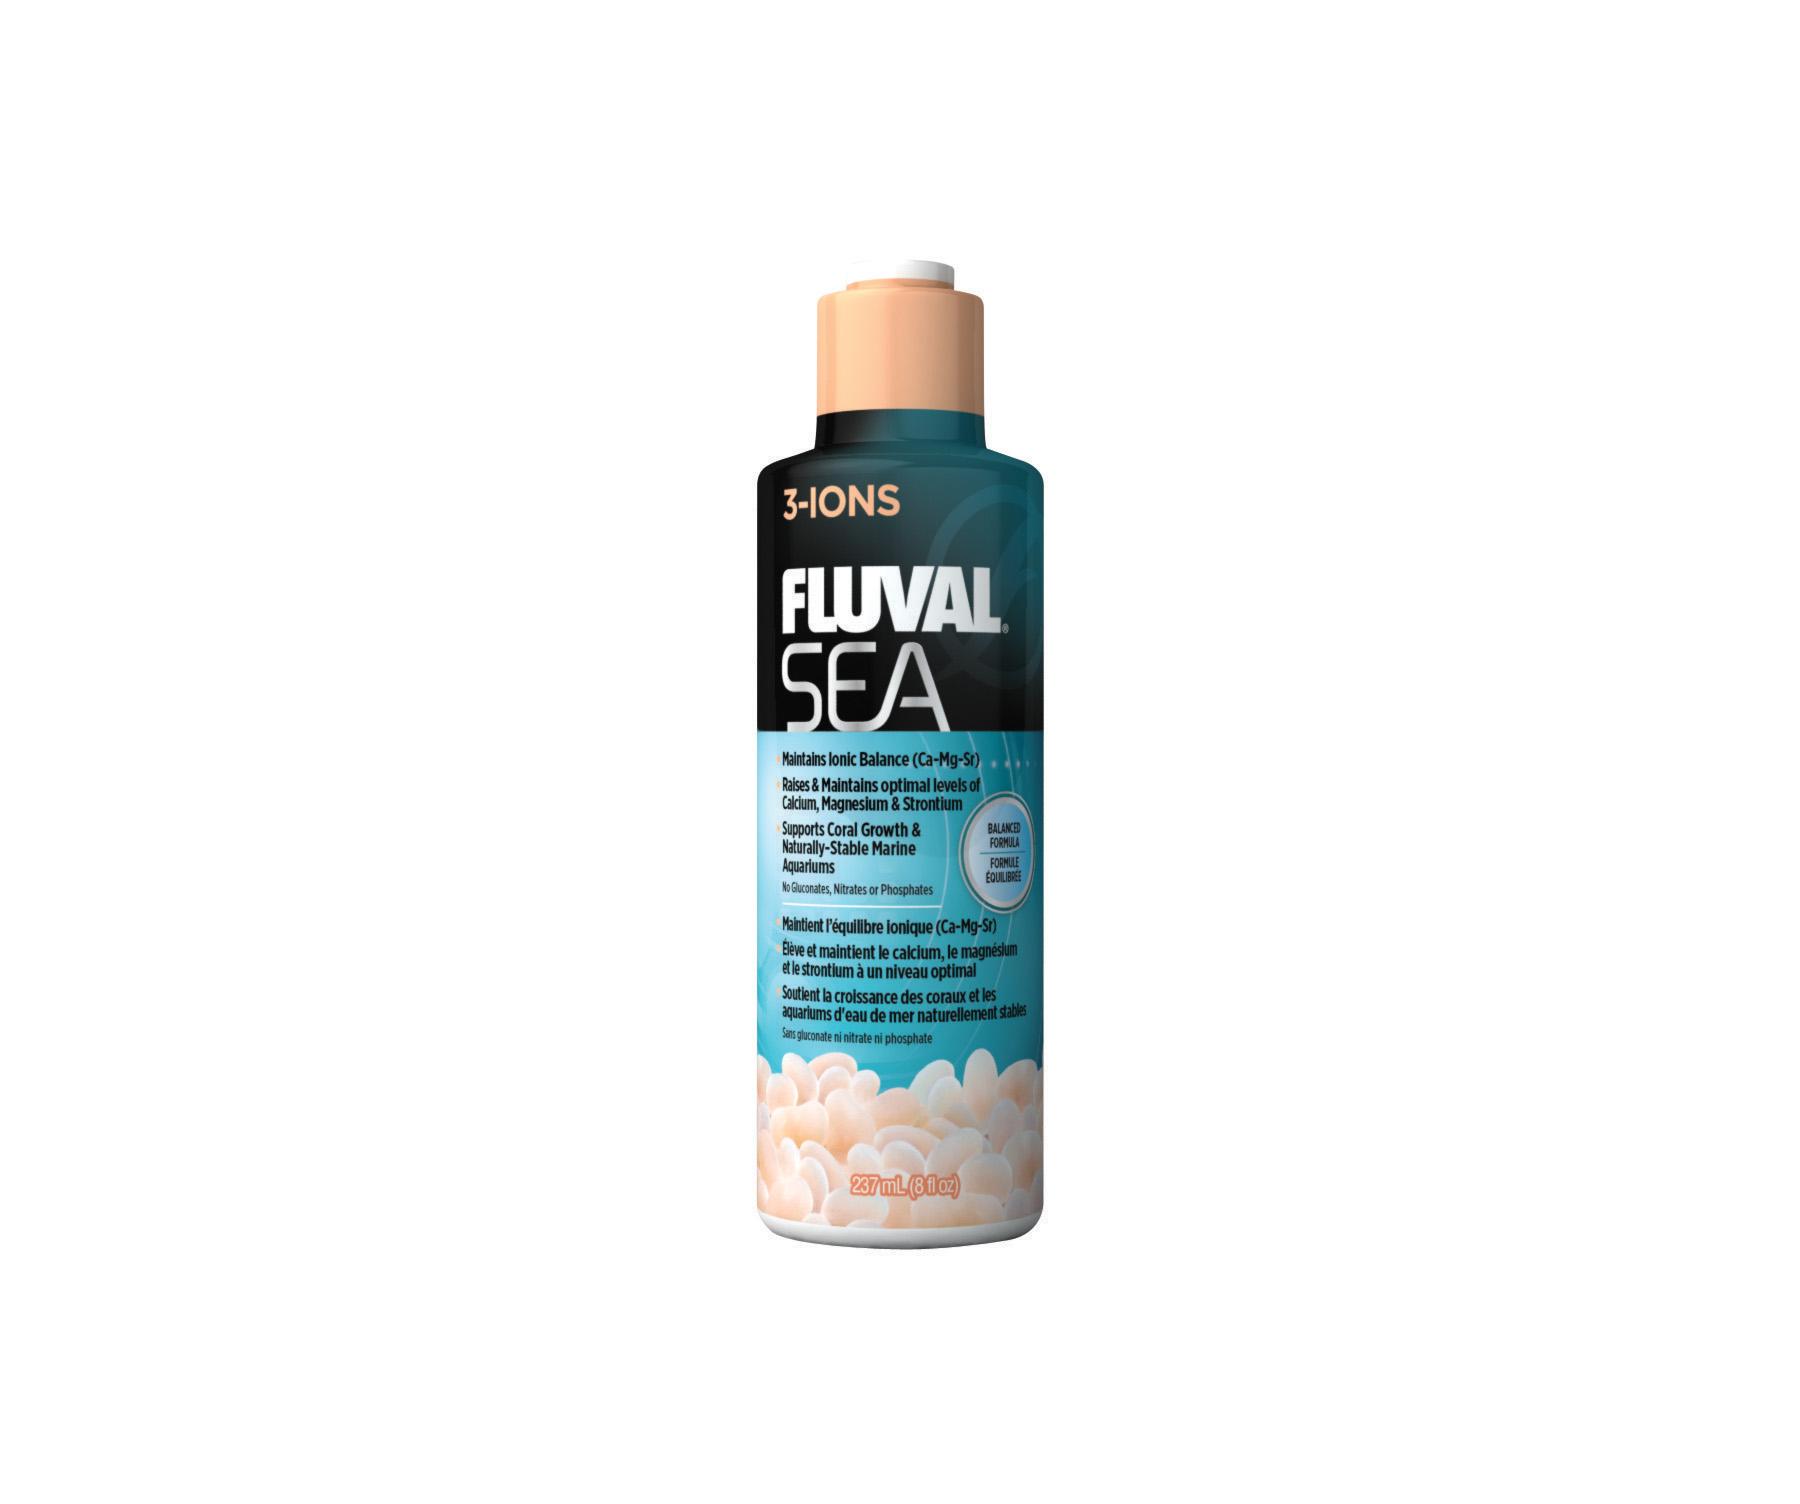 Fluval Sea 3-Ions Supplement (237 ml)